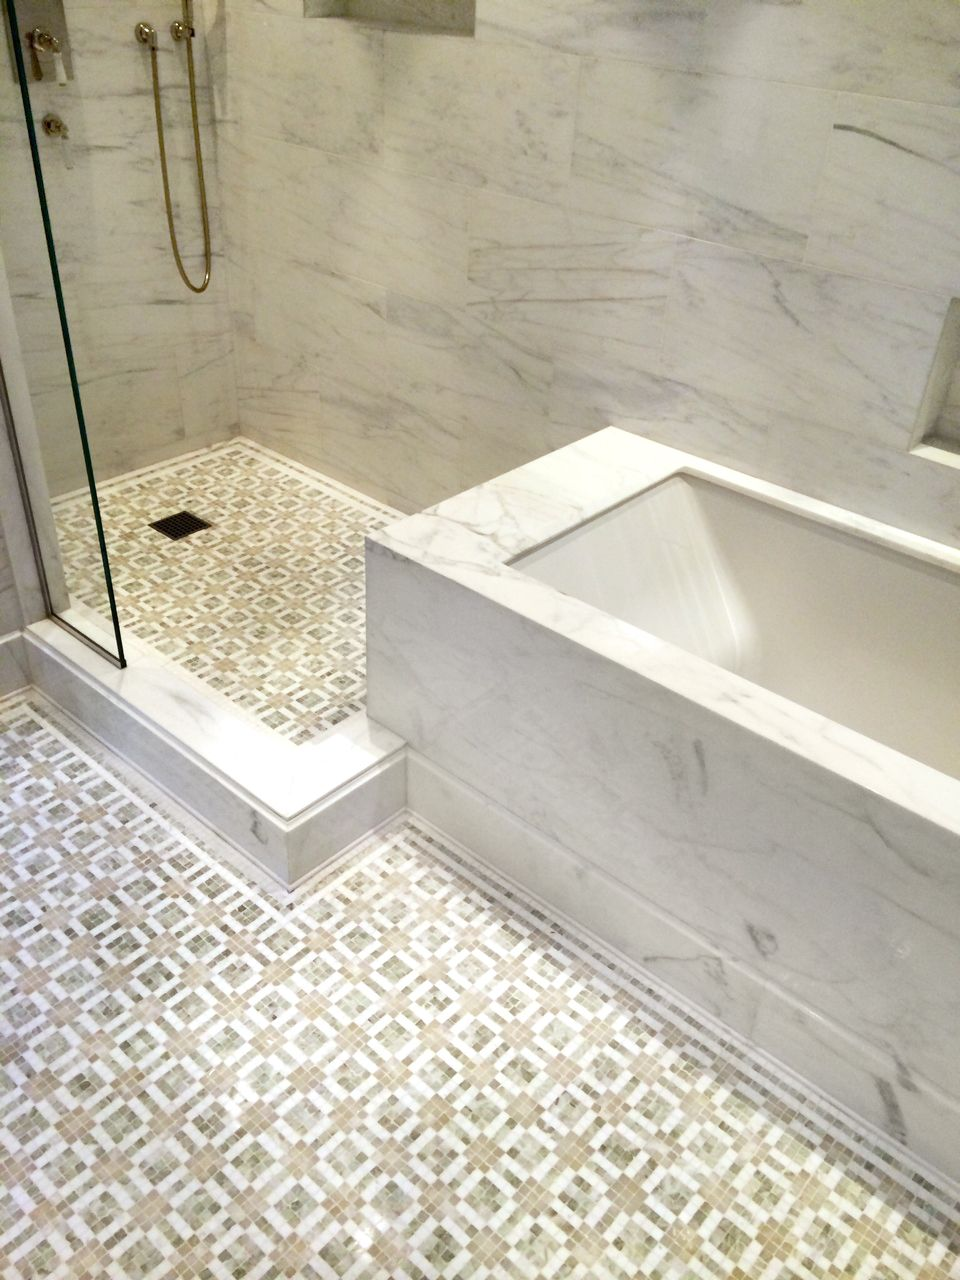 Pier Fine Associates Display Rare And Sophisticated Elegance In This Master Bathroom Design We Manufac Large Bathrooms Master Bathroom Design Bathroom Design